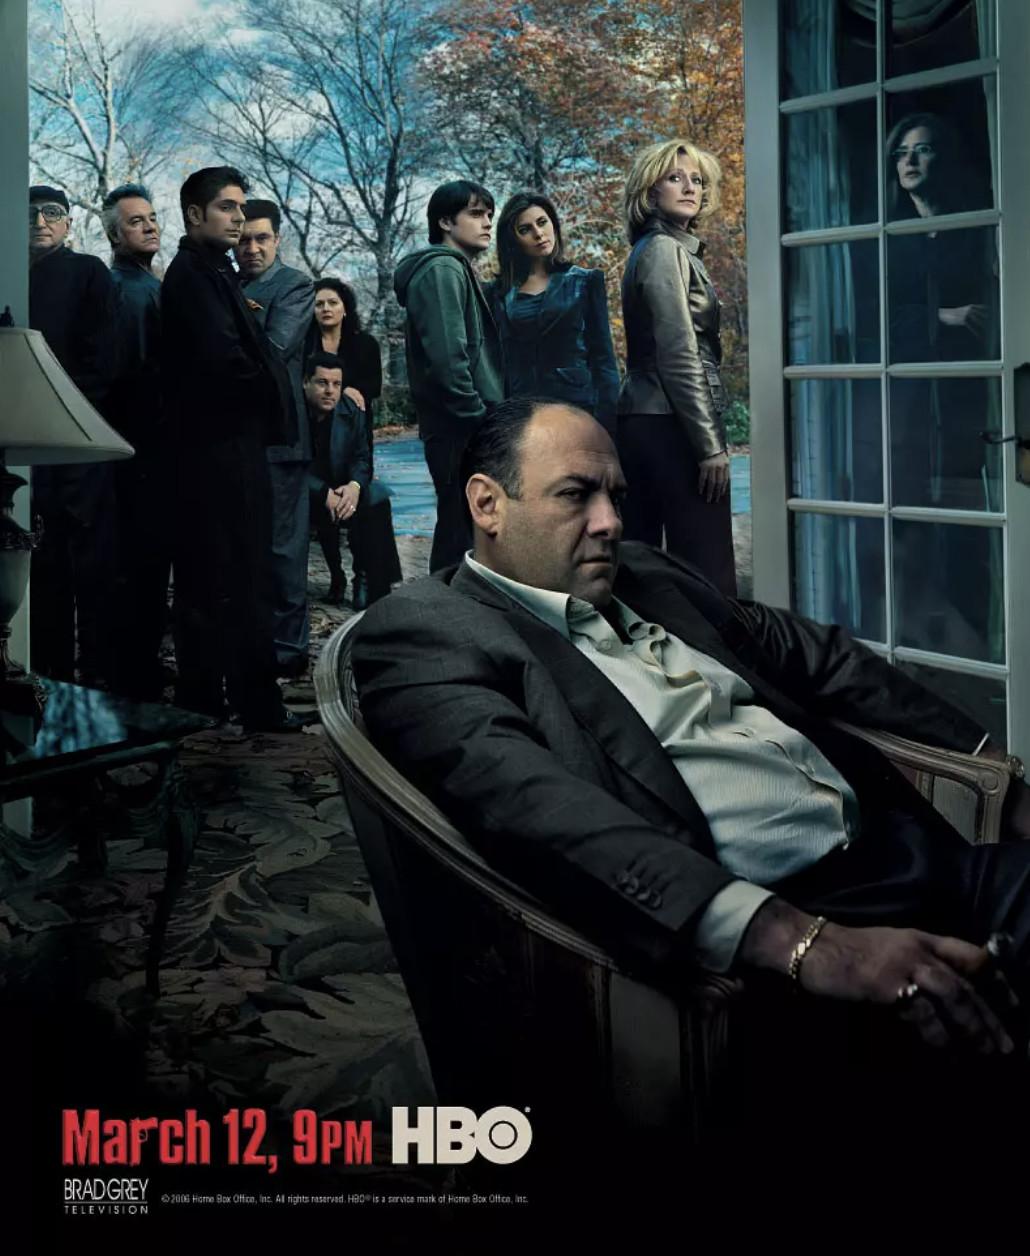 HBO的暴力爽剧,多年过去,它仍然是美剧的巅峰!